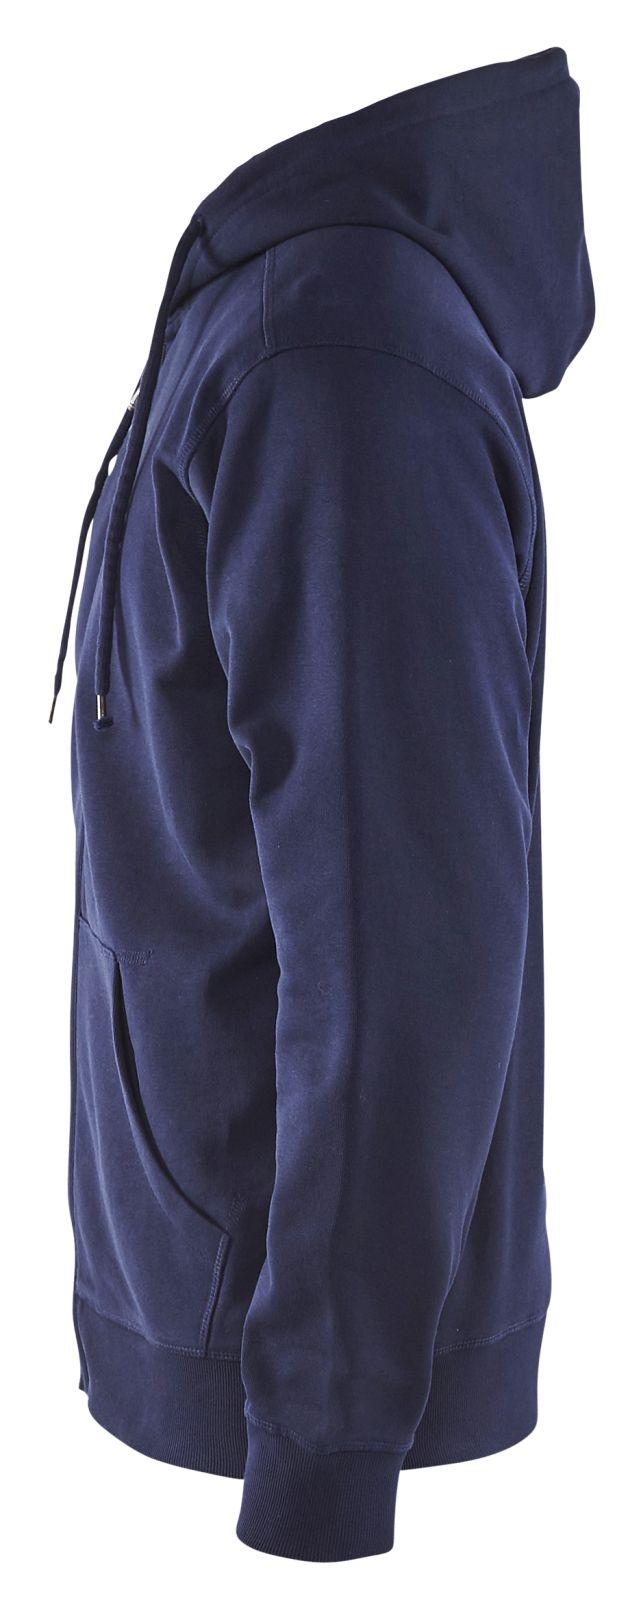 Blaklader Hooded sweatvesten 33661048 marineblauw(8800)